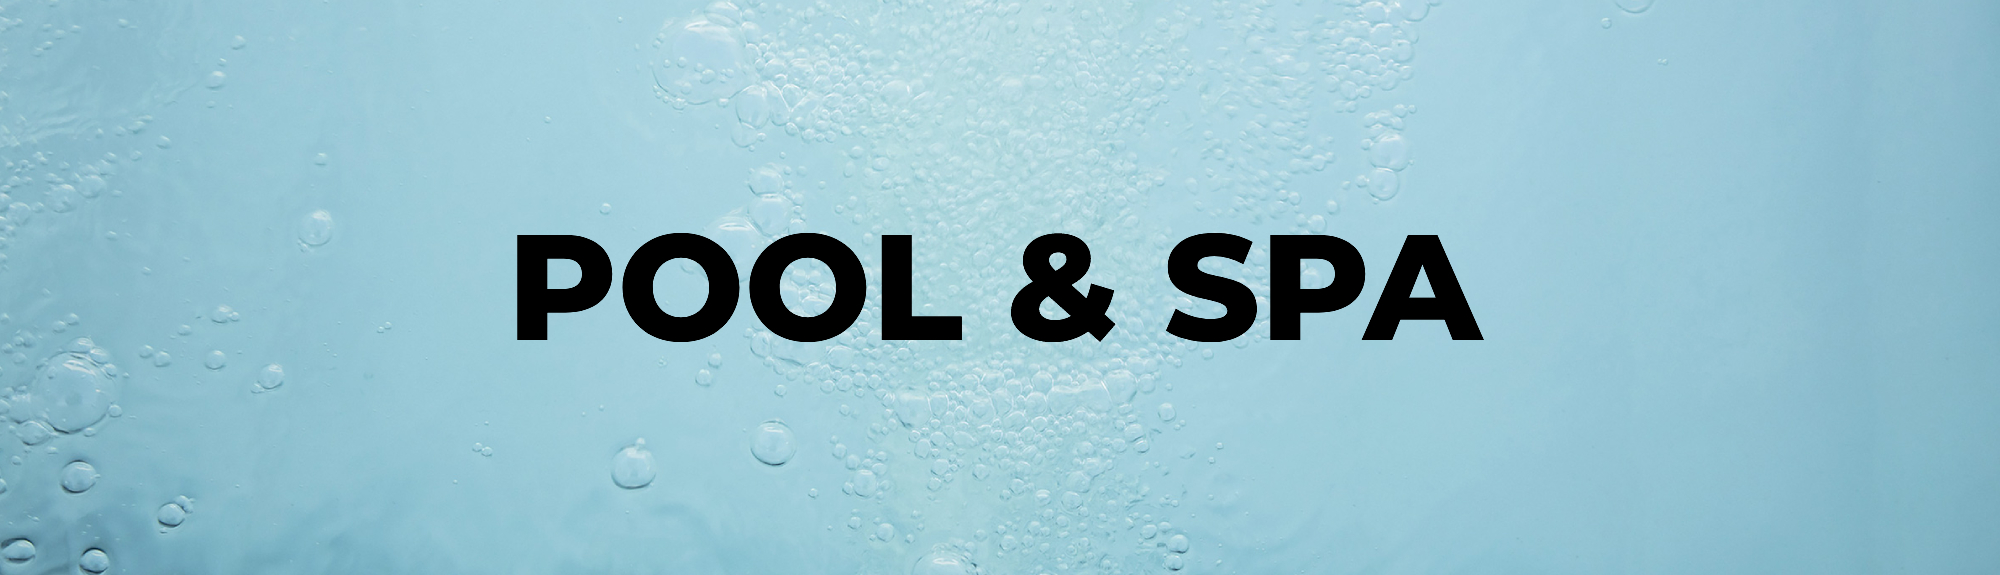 Kategori Pool & Spabad Villahome.se Banner